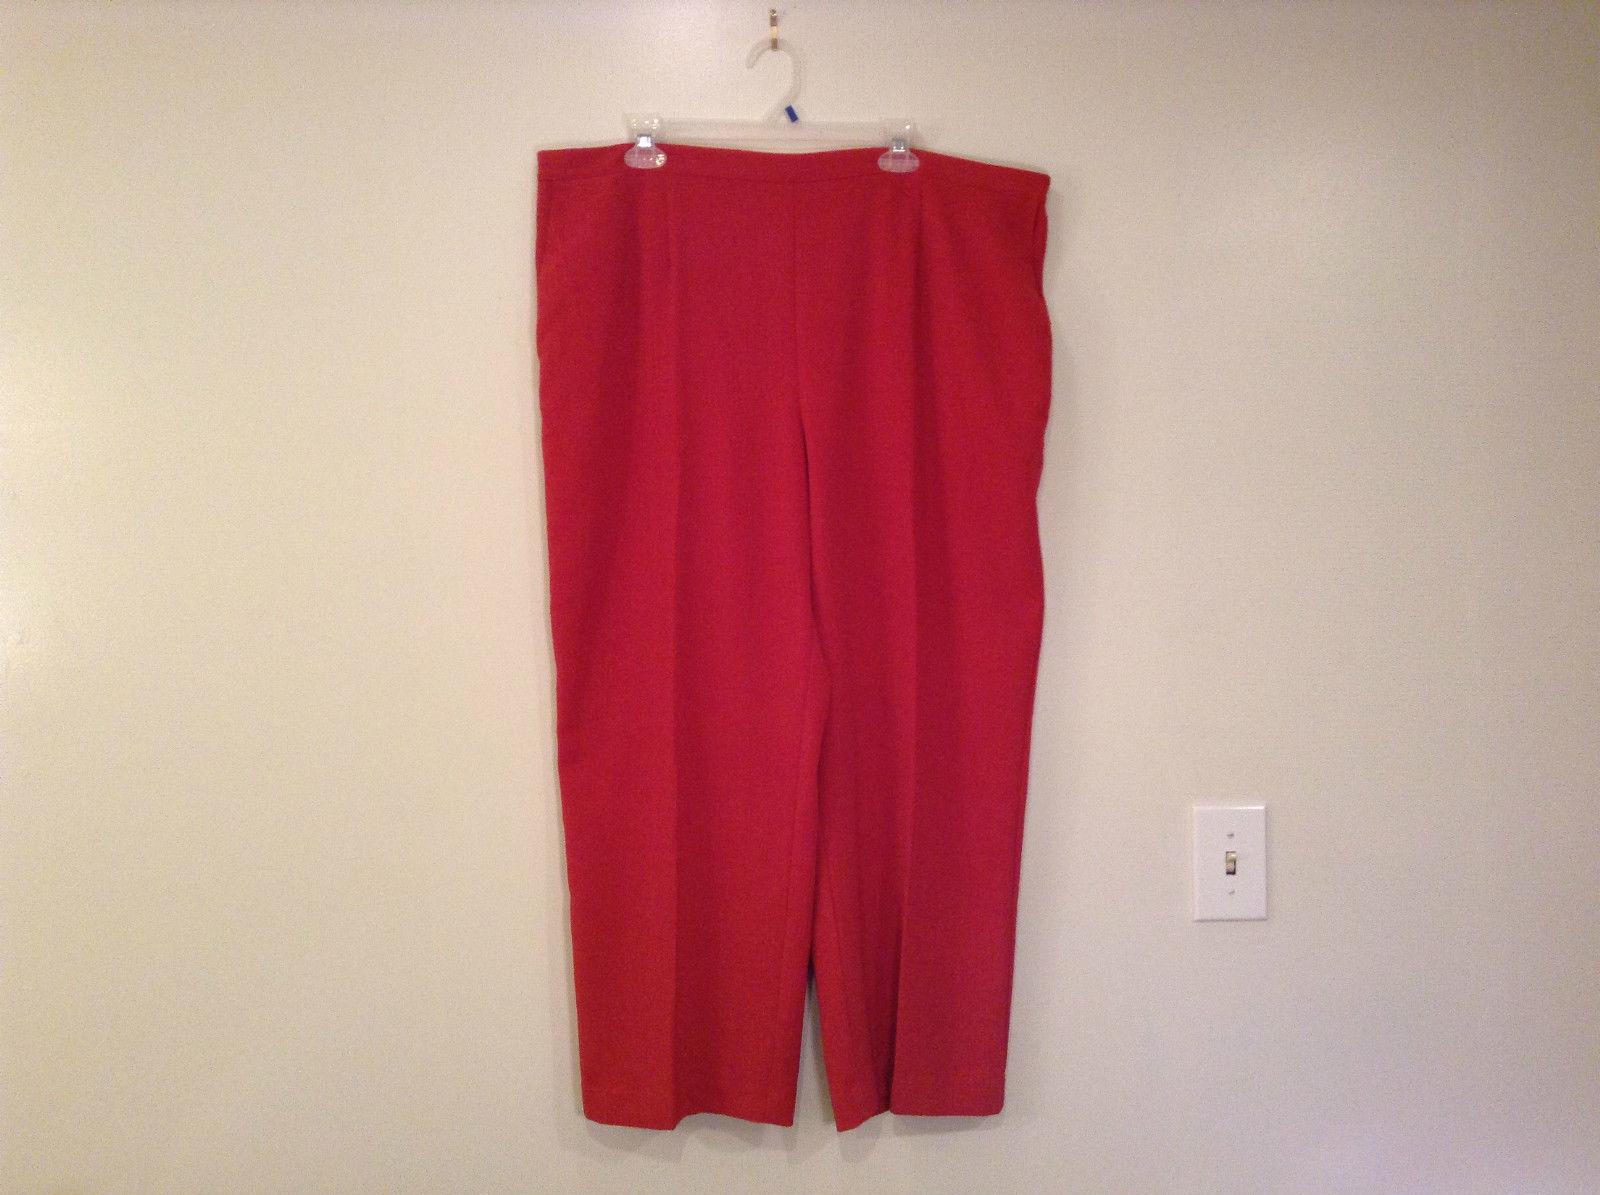 Size 22W Alfred Dunner Orange Red Unlined Dress Pants Side Pockets Elastic Waist